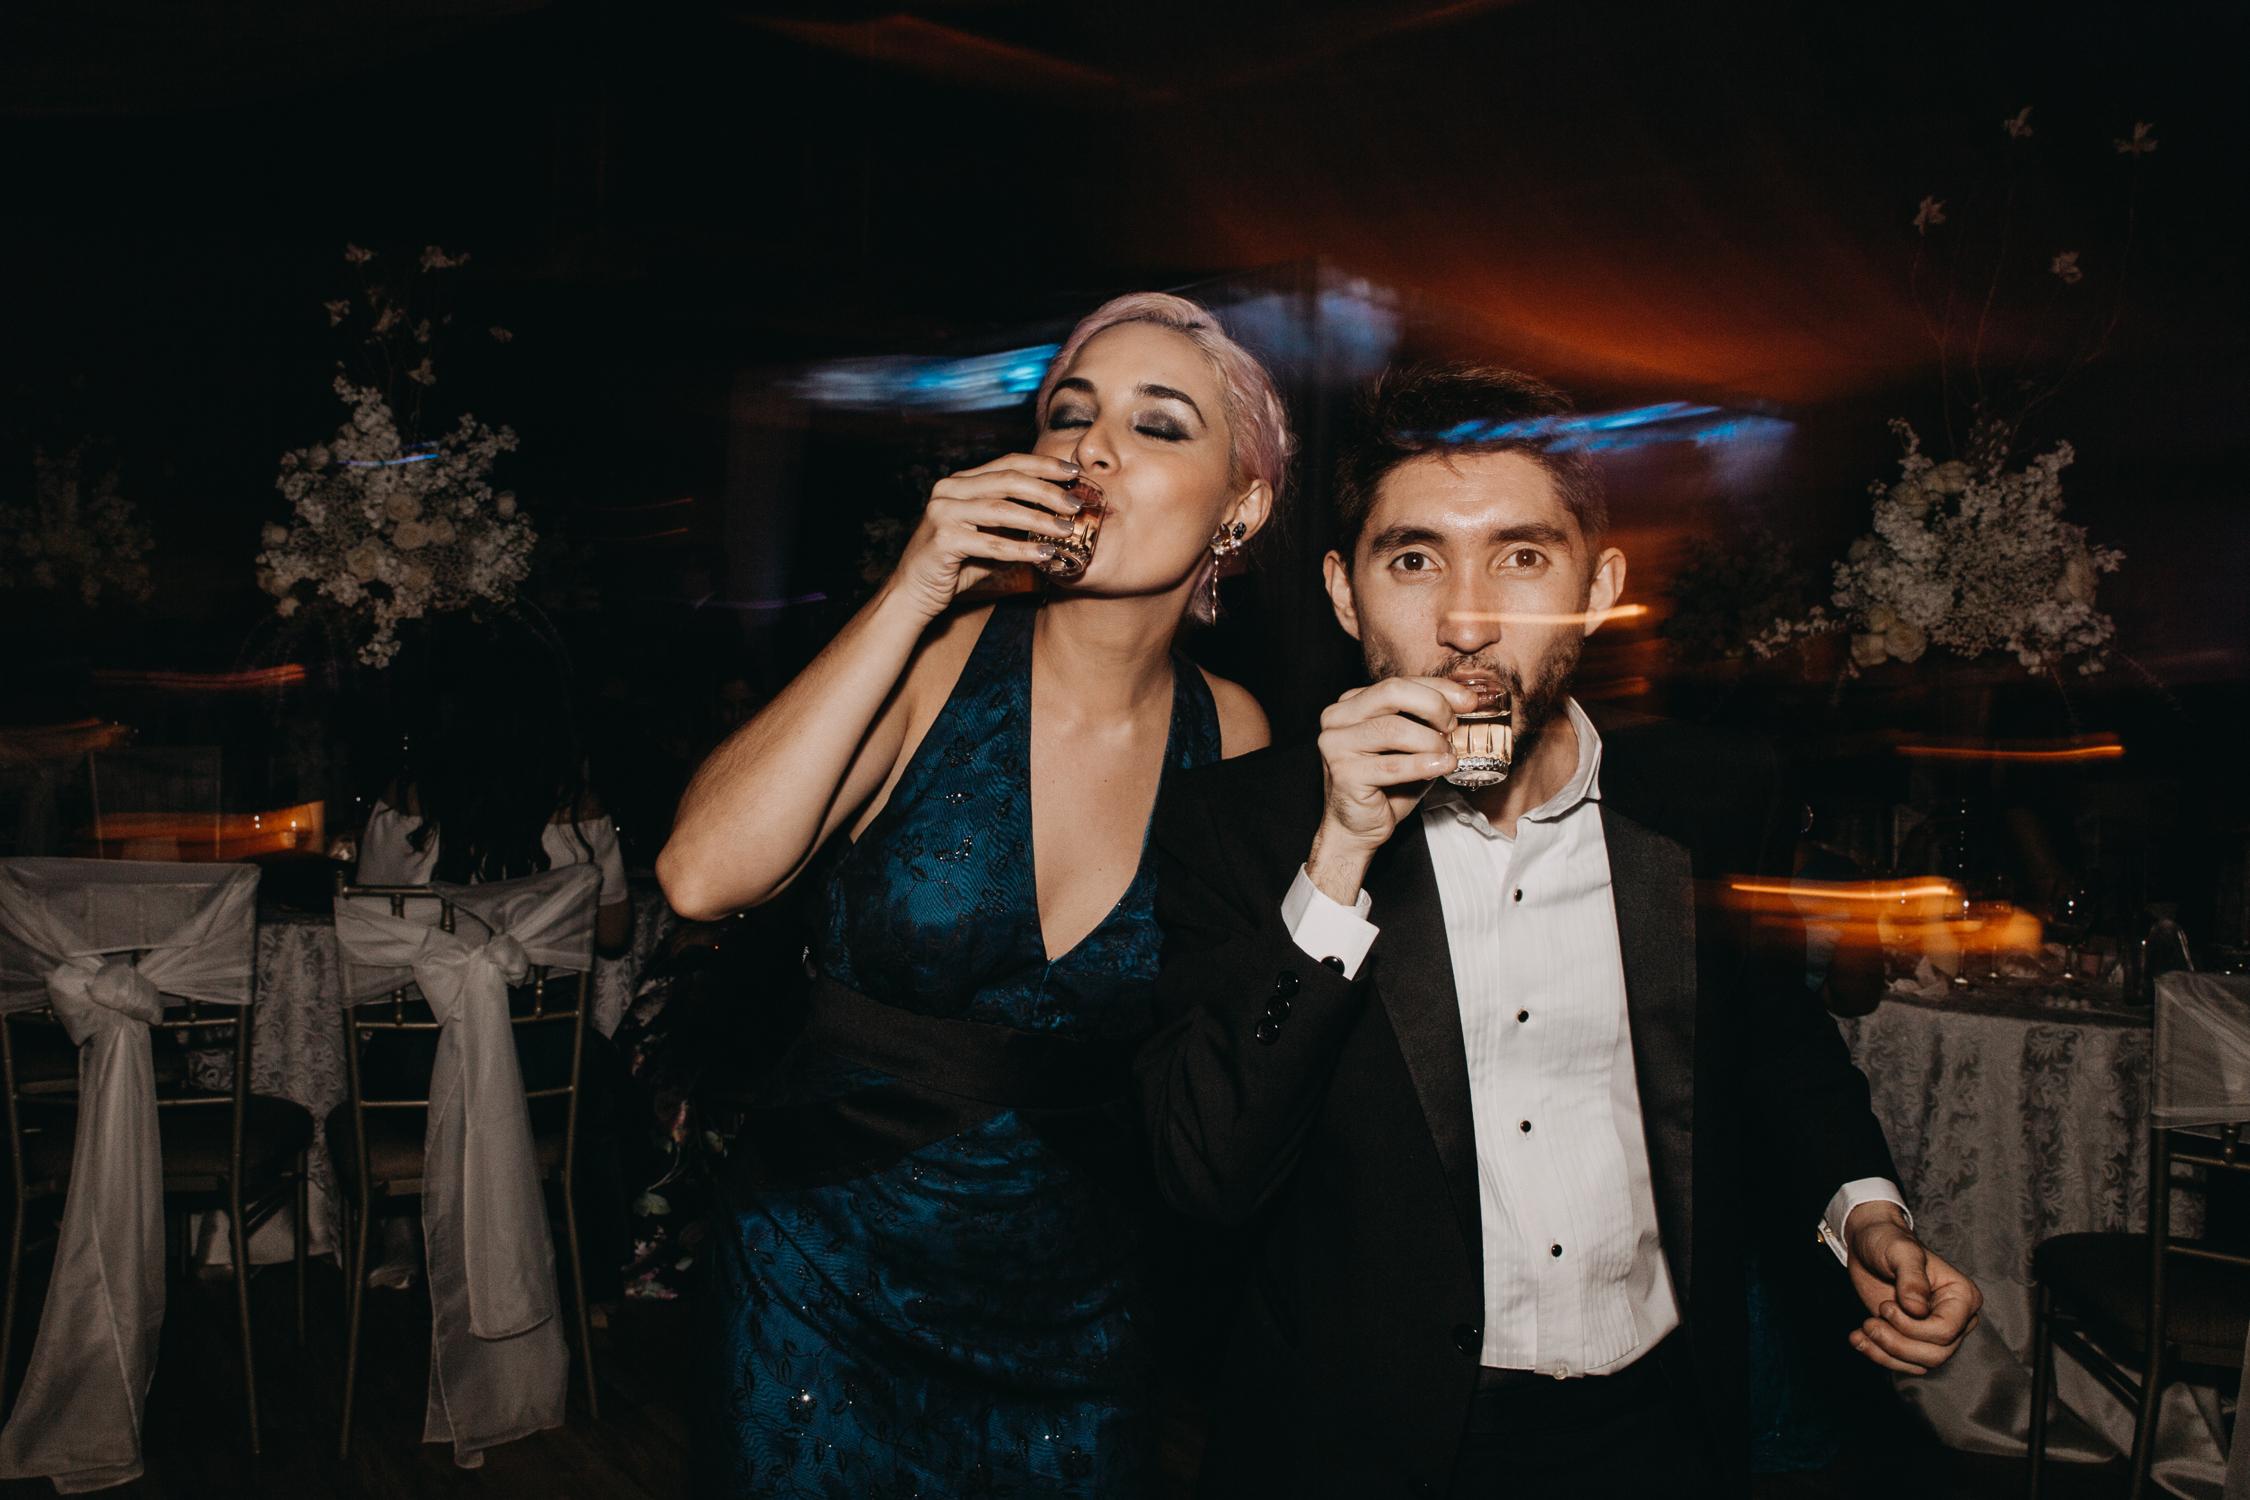 Michelle-Agurto-Fotografia-Bodas-Ecuador-Destination-Wedding-Photographer-Vicky-Javier-224.JPG